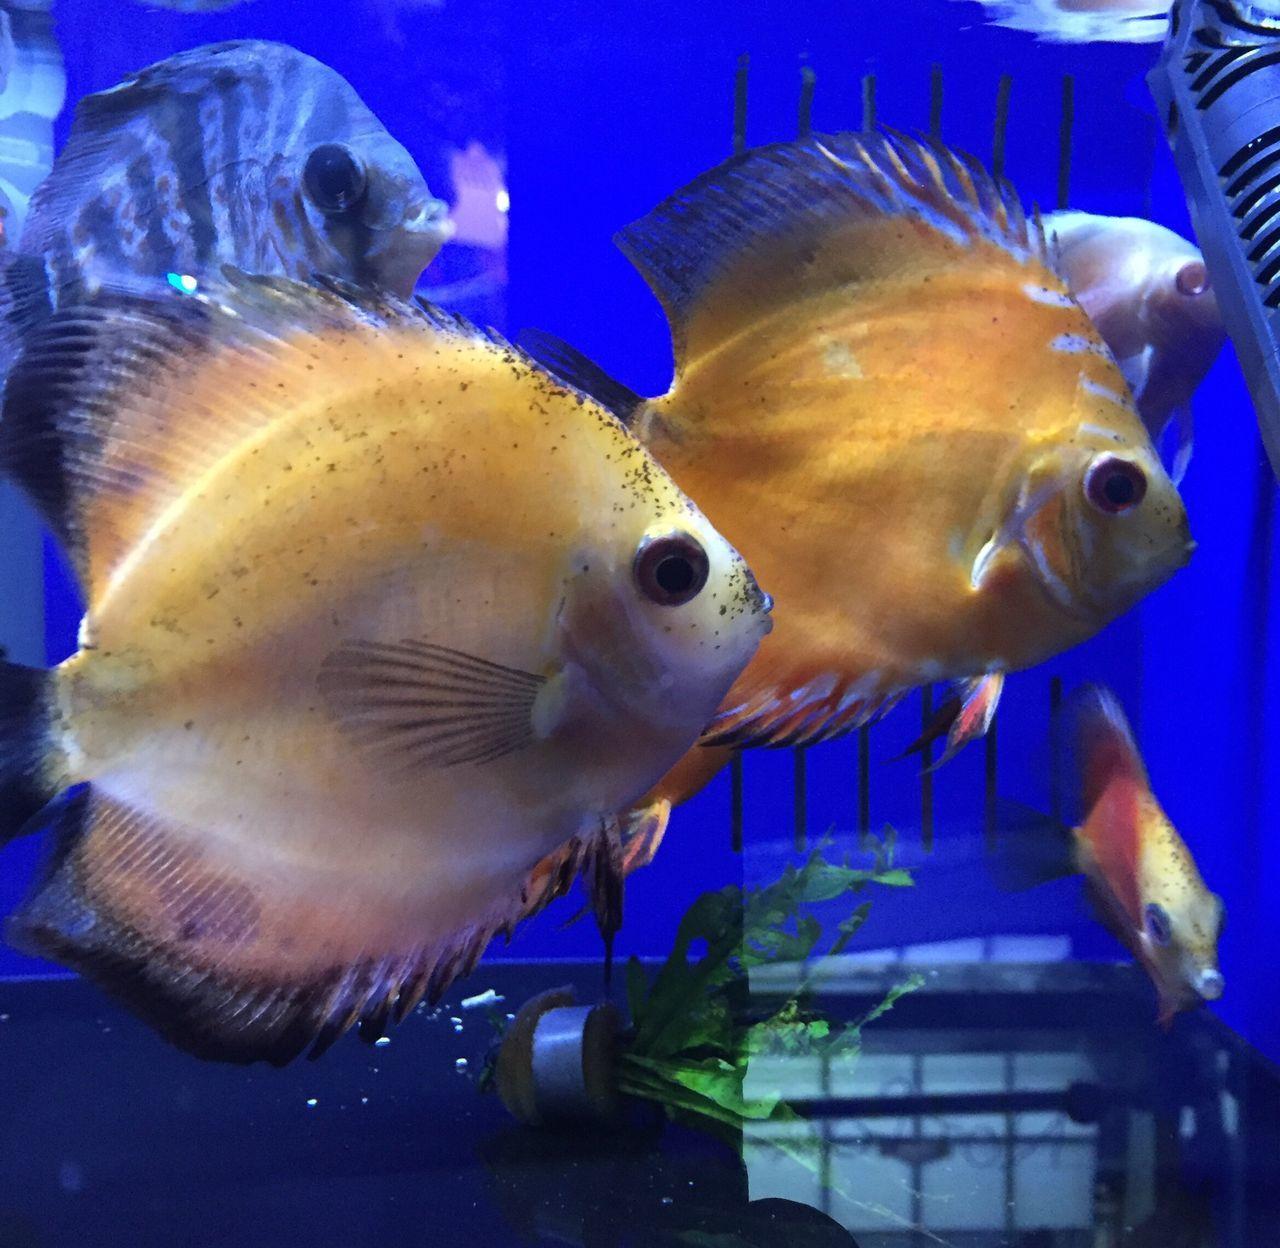 animal themes, fish, water, sea life, aquarium, animals in the wild, underwater, animals in captivity, swimming, no people, animal wildlife, indoors, close-up, blue, one animal, nature, goldfish, undersea, day, mammal